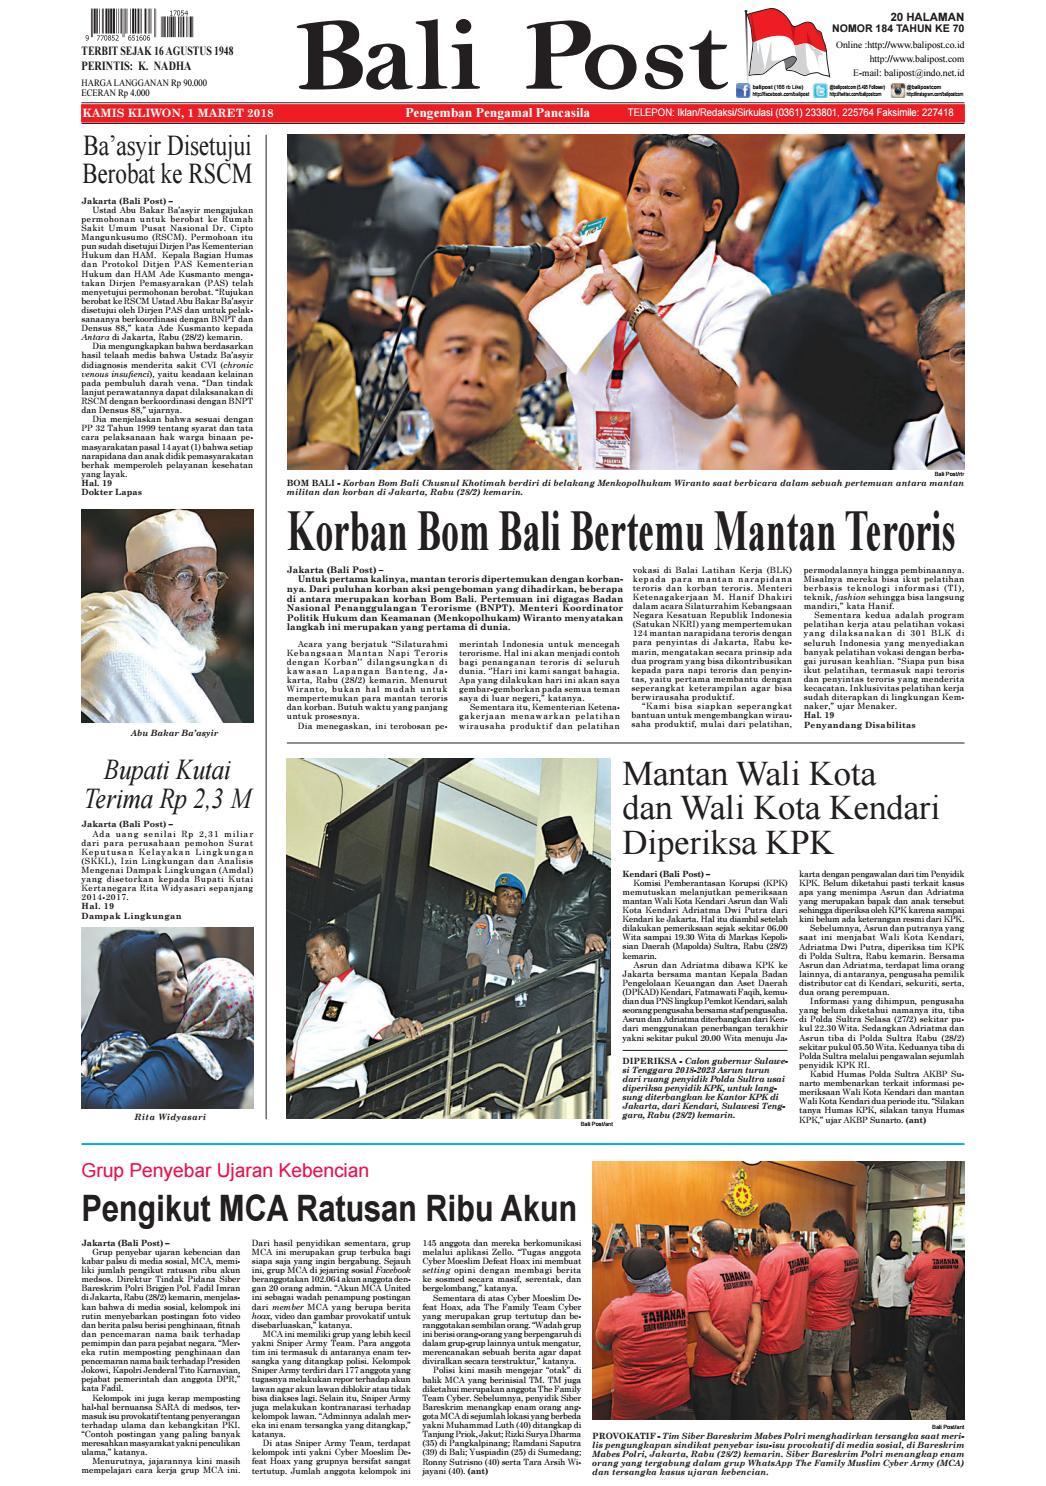 Edisi 01 Maret 2018 Balipostcom By E Paper Kmb Issuu Produk Ukm Bumn Tenun Pagatan Atasan Wanita 4